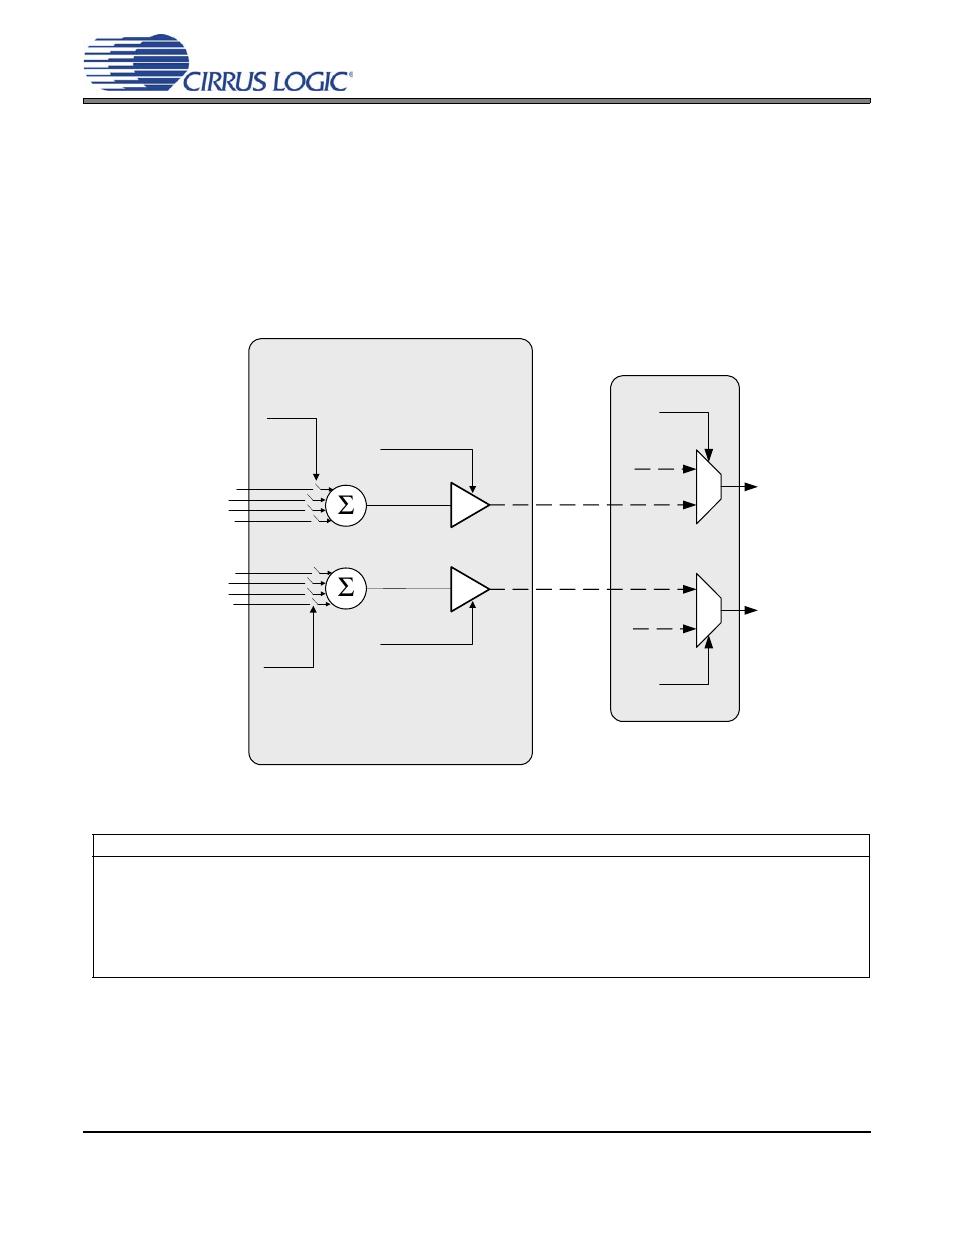 logic pro 8 user manual daily instruction manual guides u2022 rh testingwordpress co